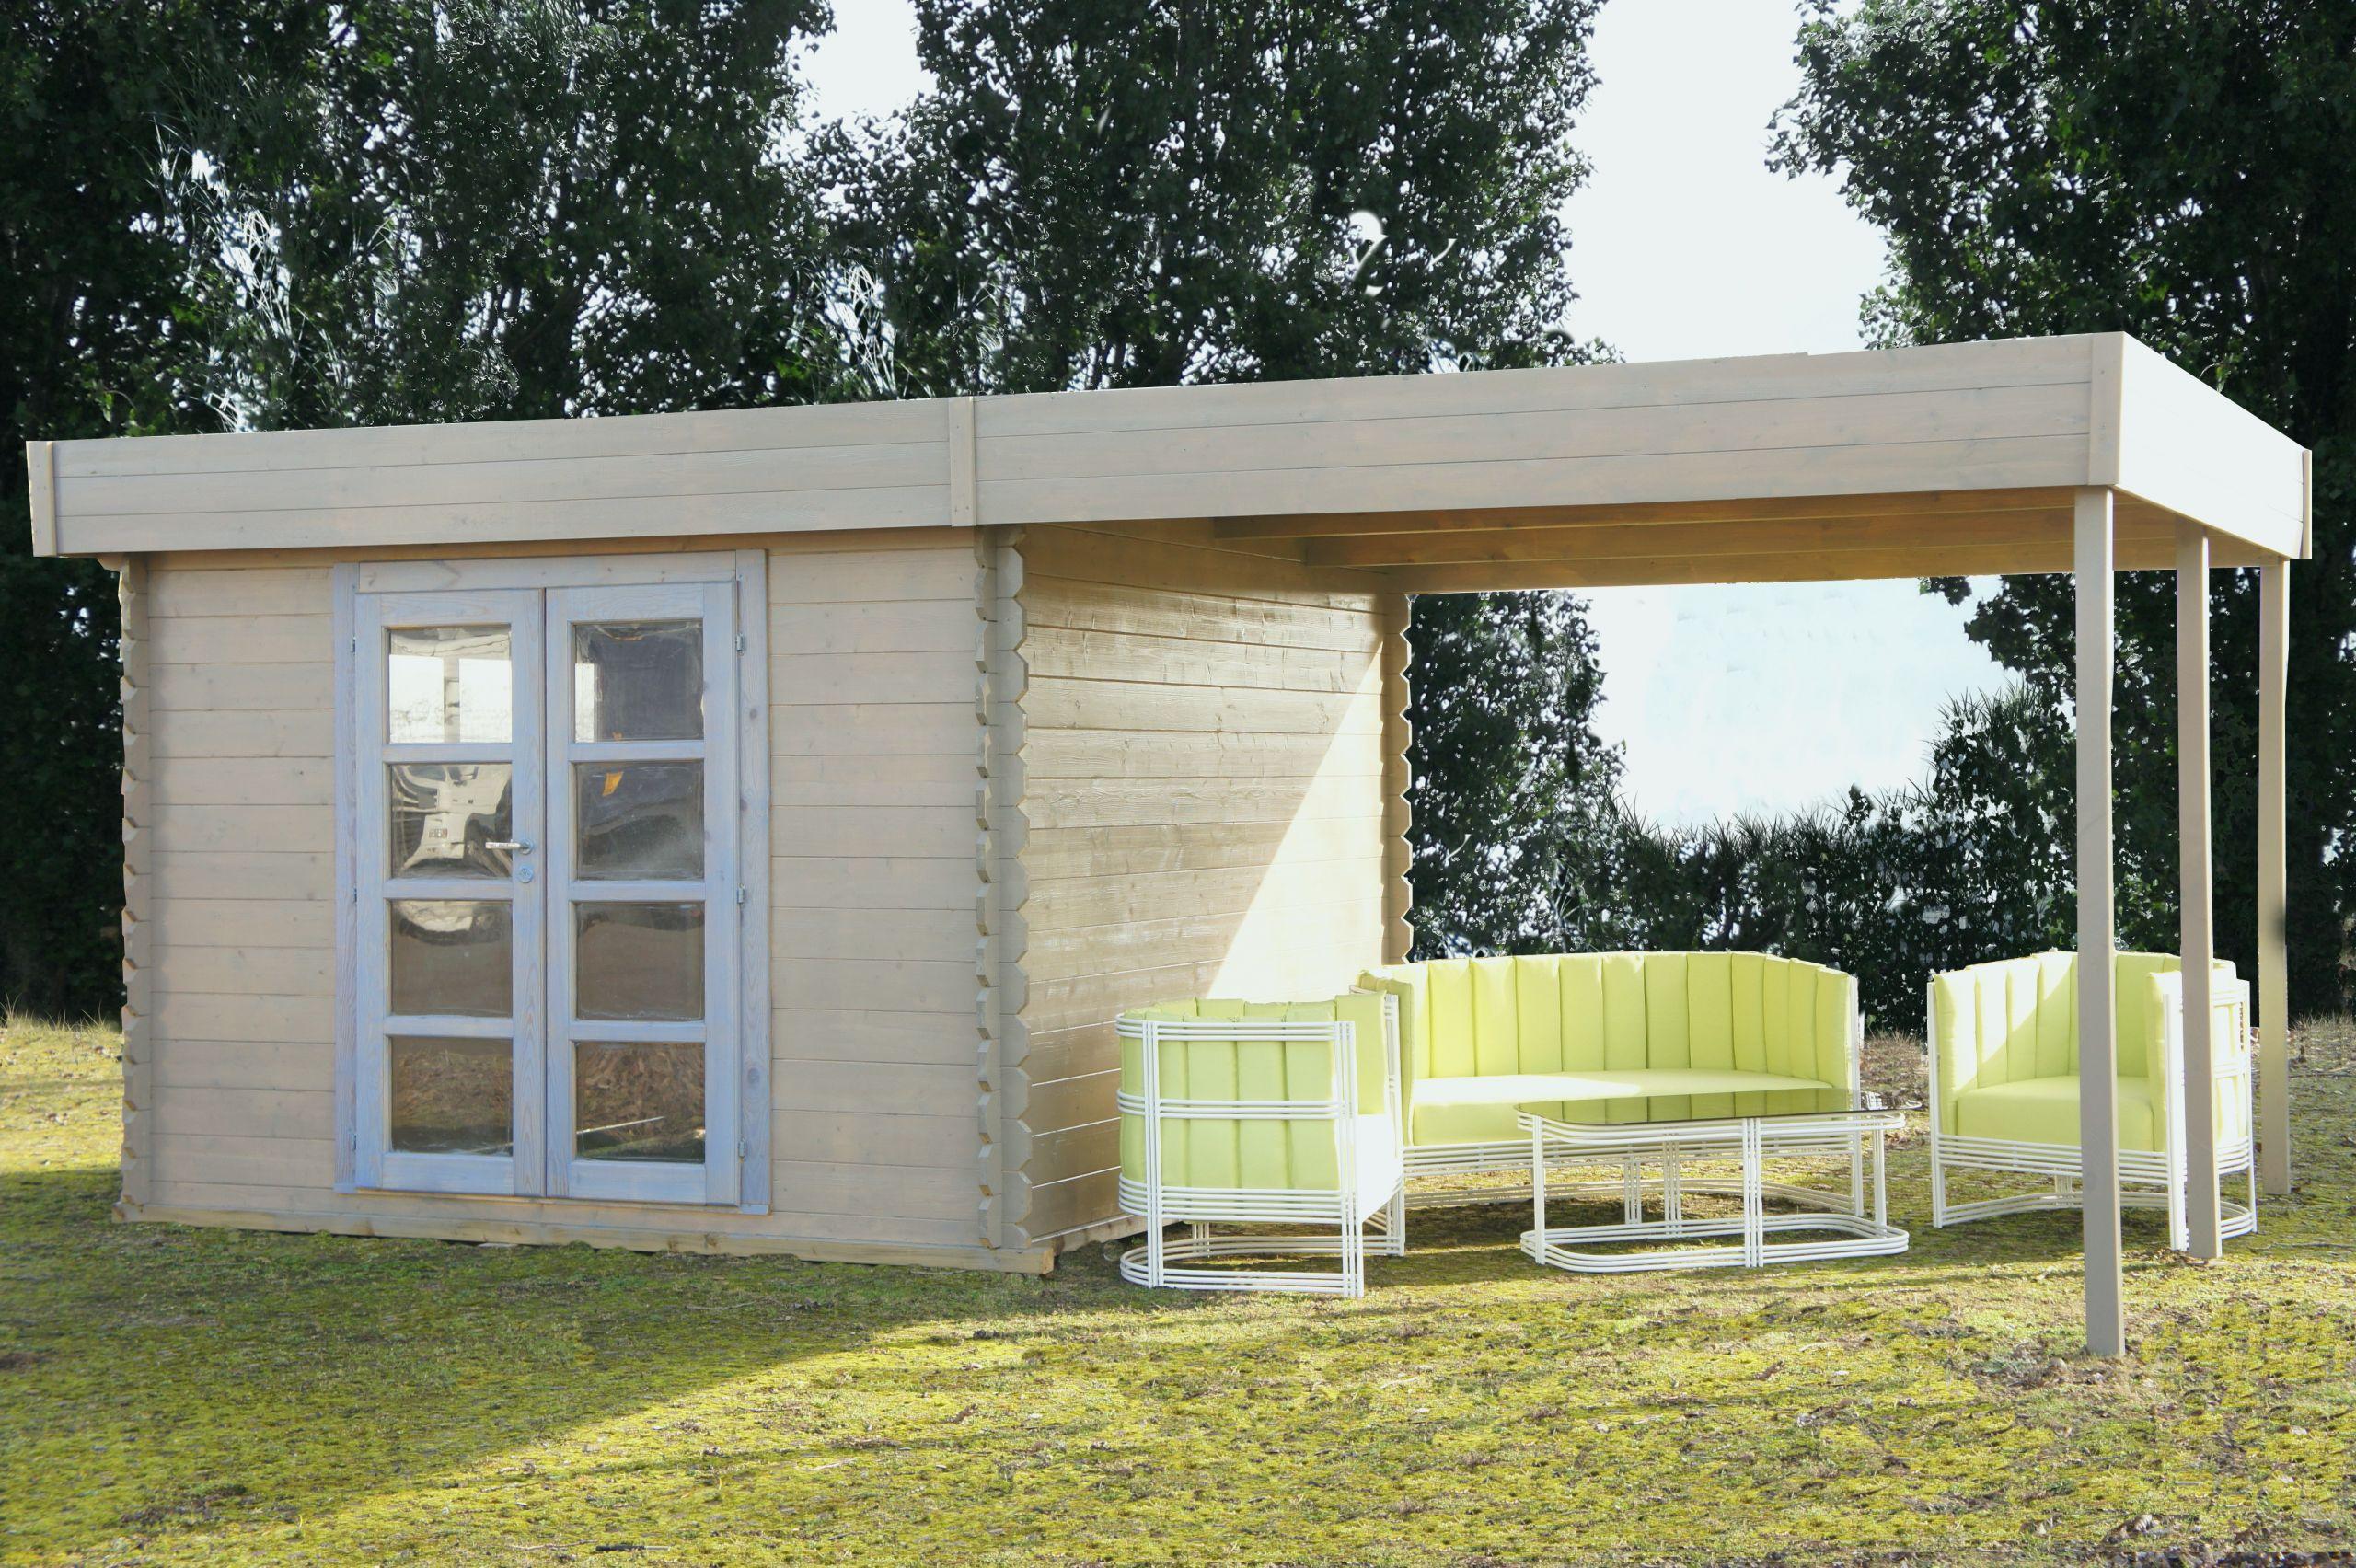 construire abri jardin bois beautiful construire un garage contre une maison of construire abri jardin bois